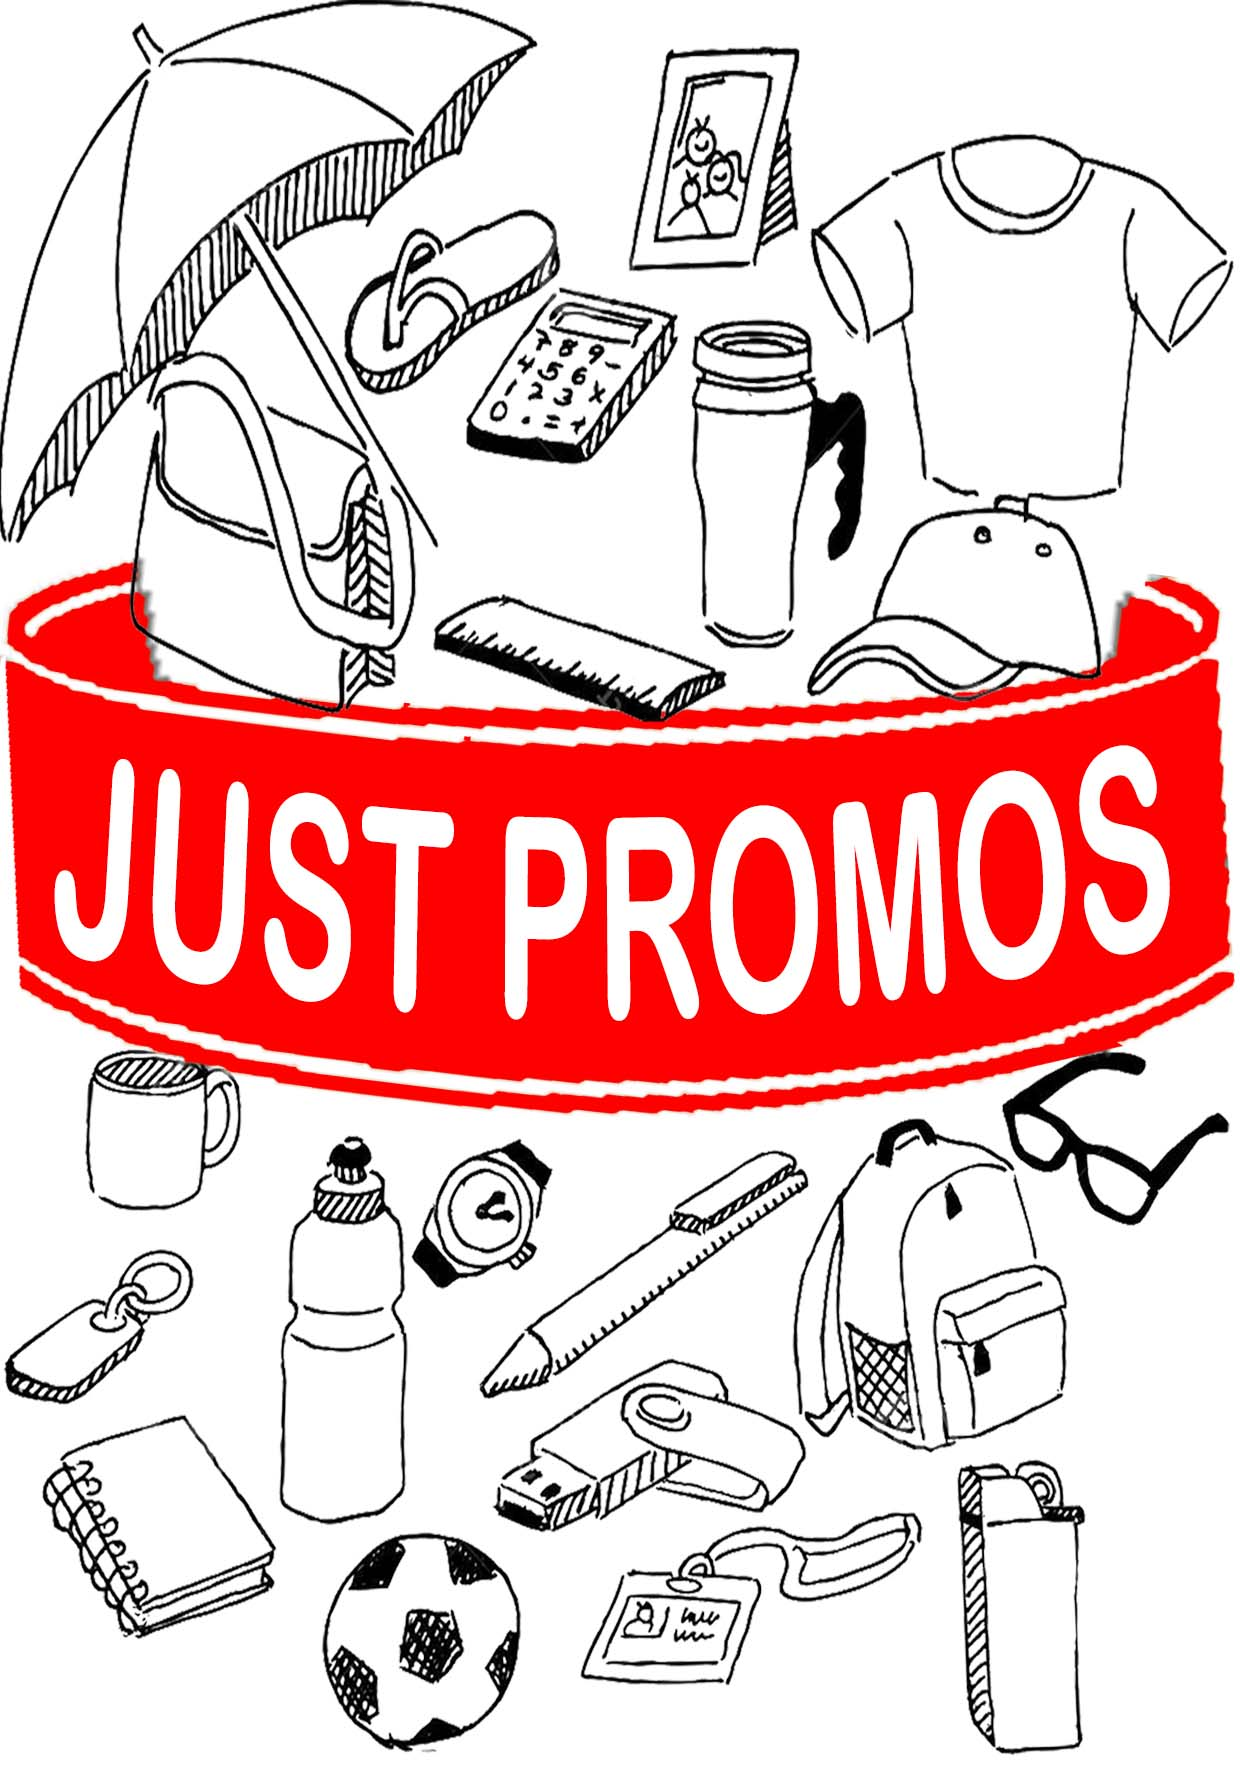 Just Promo